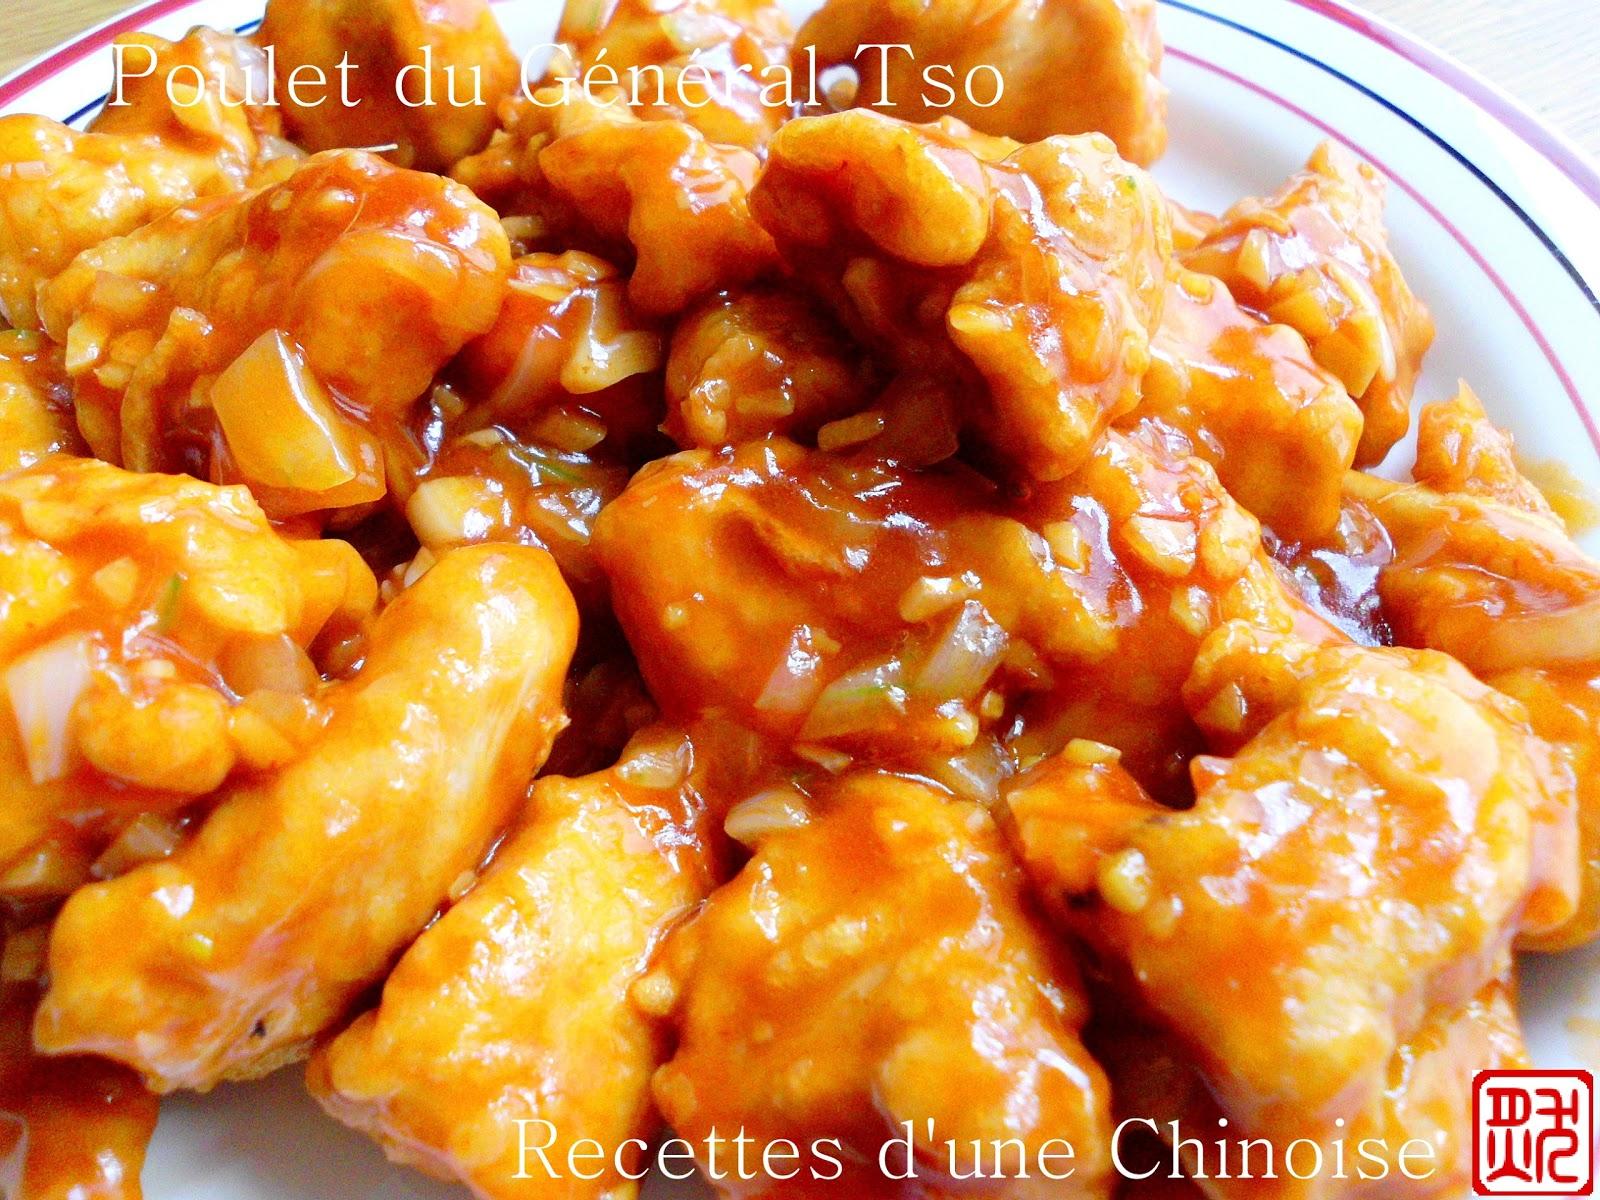 recettes d 39 une chinoise poulet du general zuo ou tso zu z ng t ng j. Black Bedroom Furniture Sets. Home Design Ideas